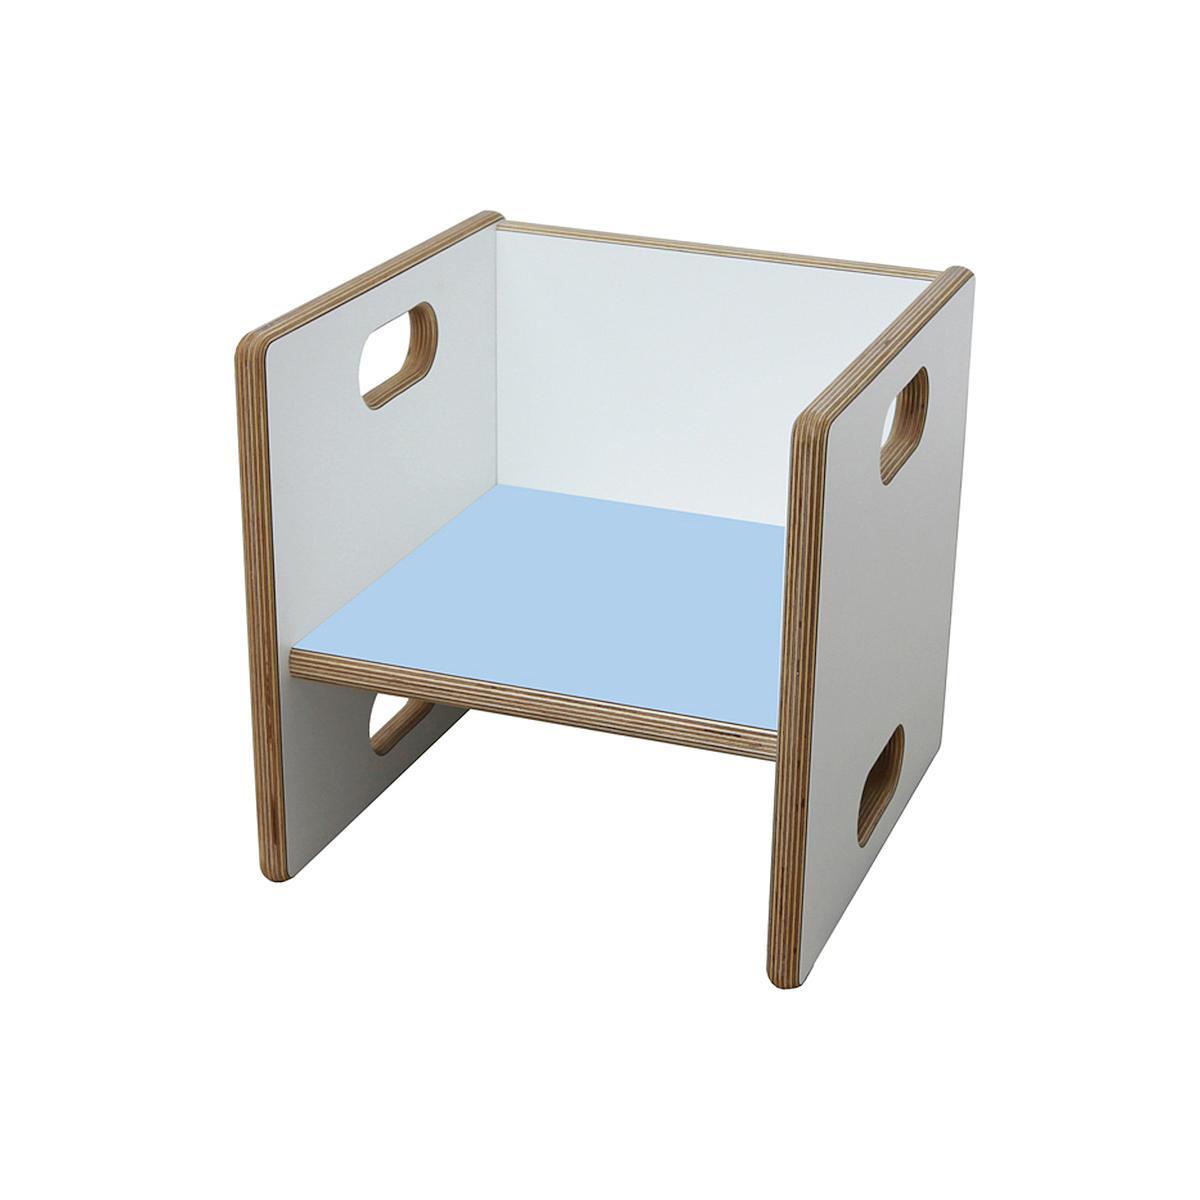 Wandelstuhl DECOR Debreuyn Multiplex-weiß Sitzfläche hellblau - OHNE VERPACKUNG B 32 x H 32 x T 32 cm